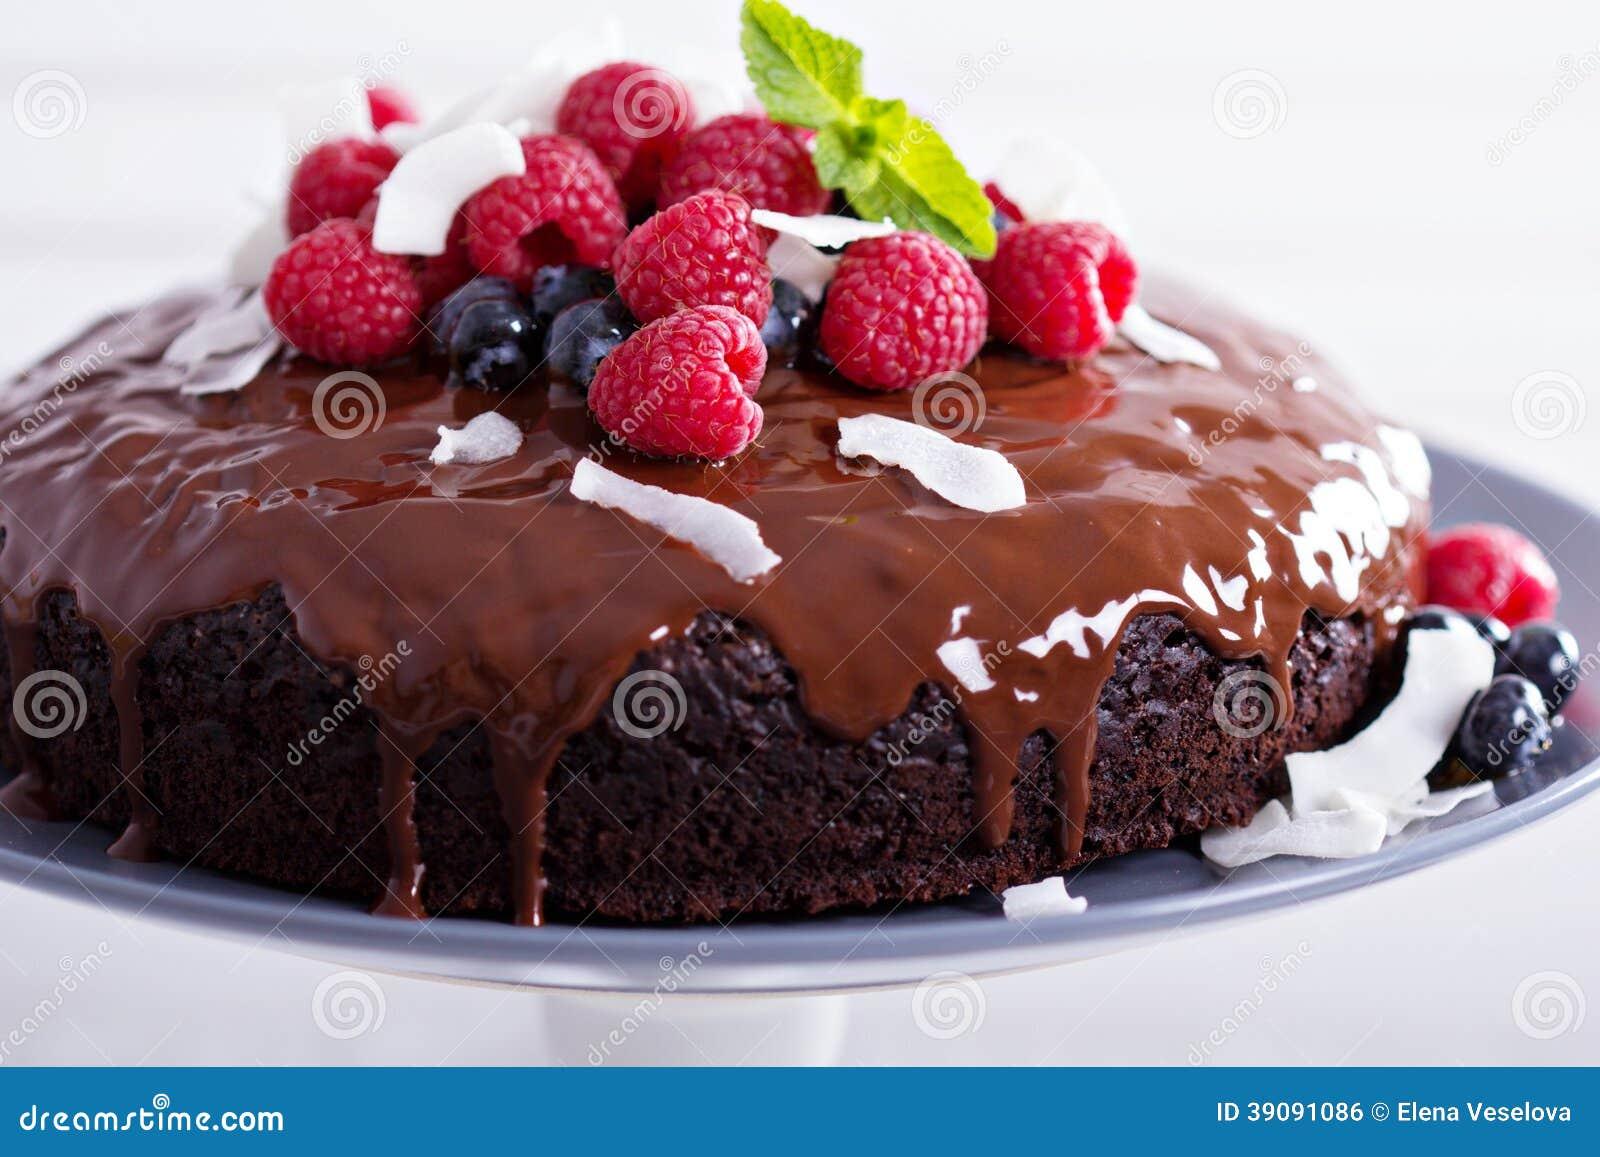 Vegan Chocolate Cake Stock Photo Image 39091086